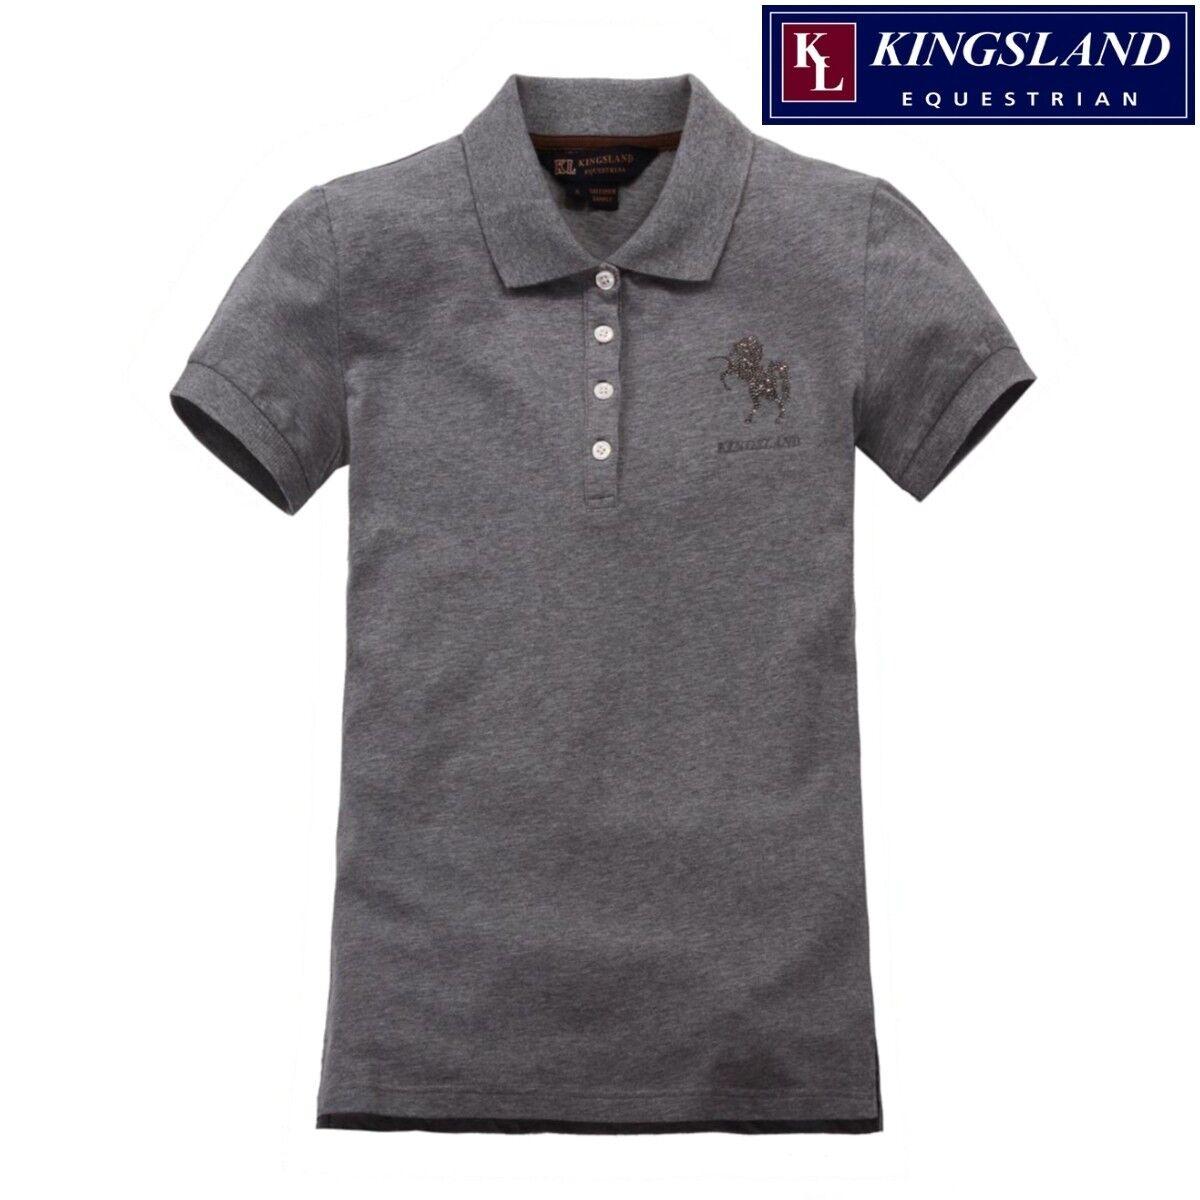 Kingsland Wembley Ladies Polo Shirt Horse Motif Was  NEW